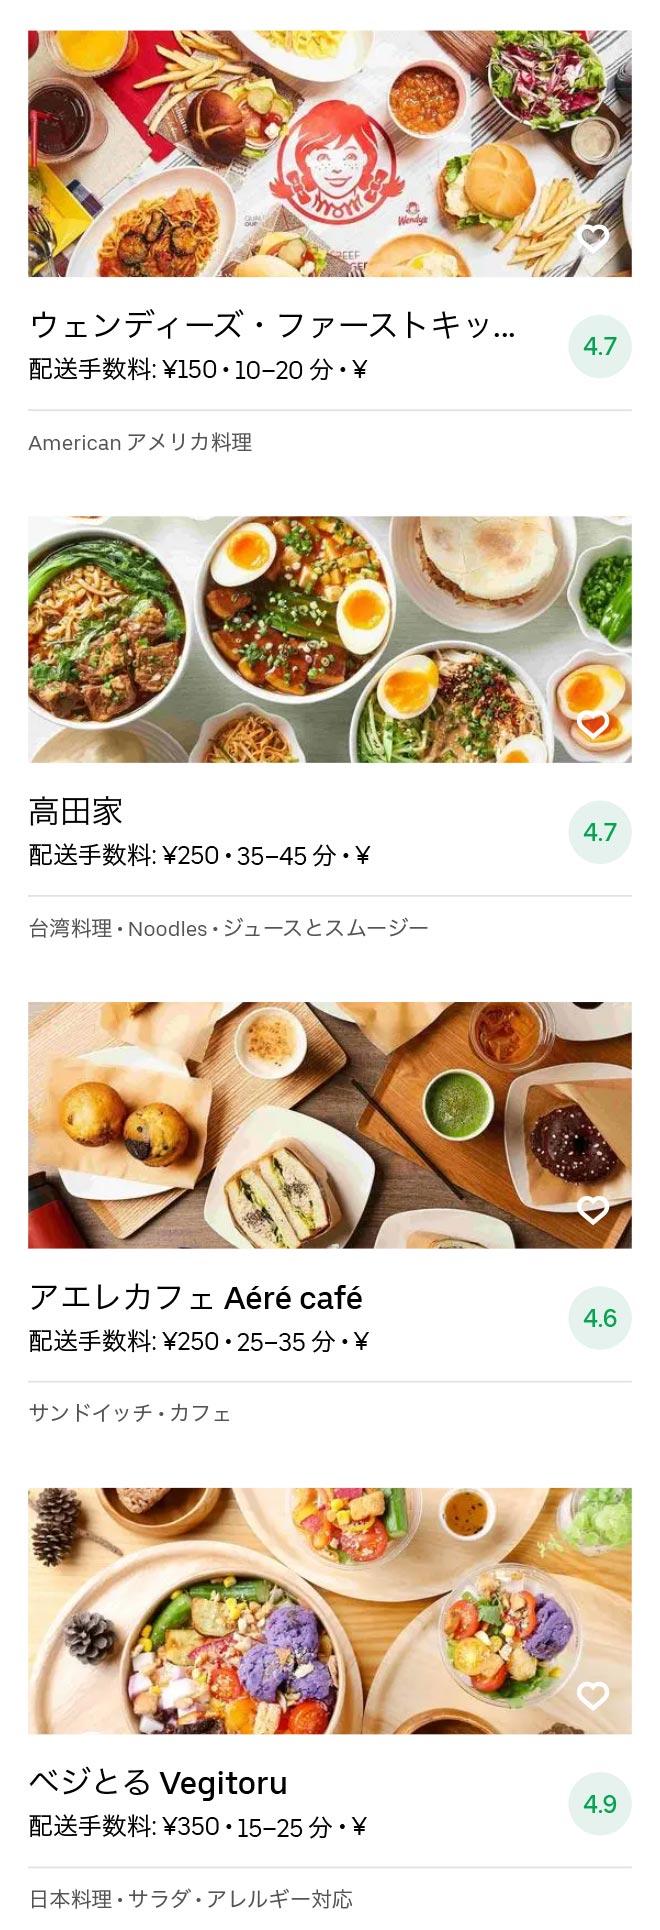 Inage menu 2010 10